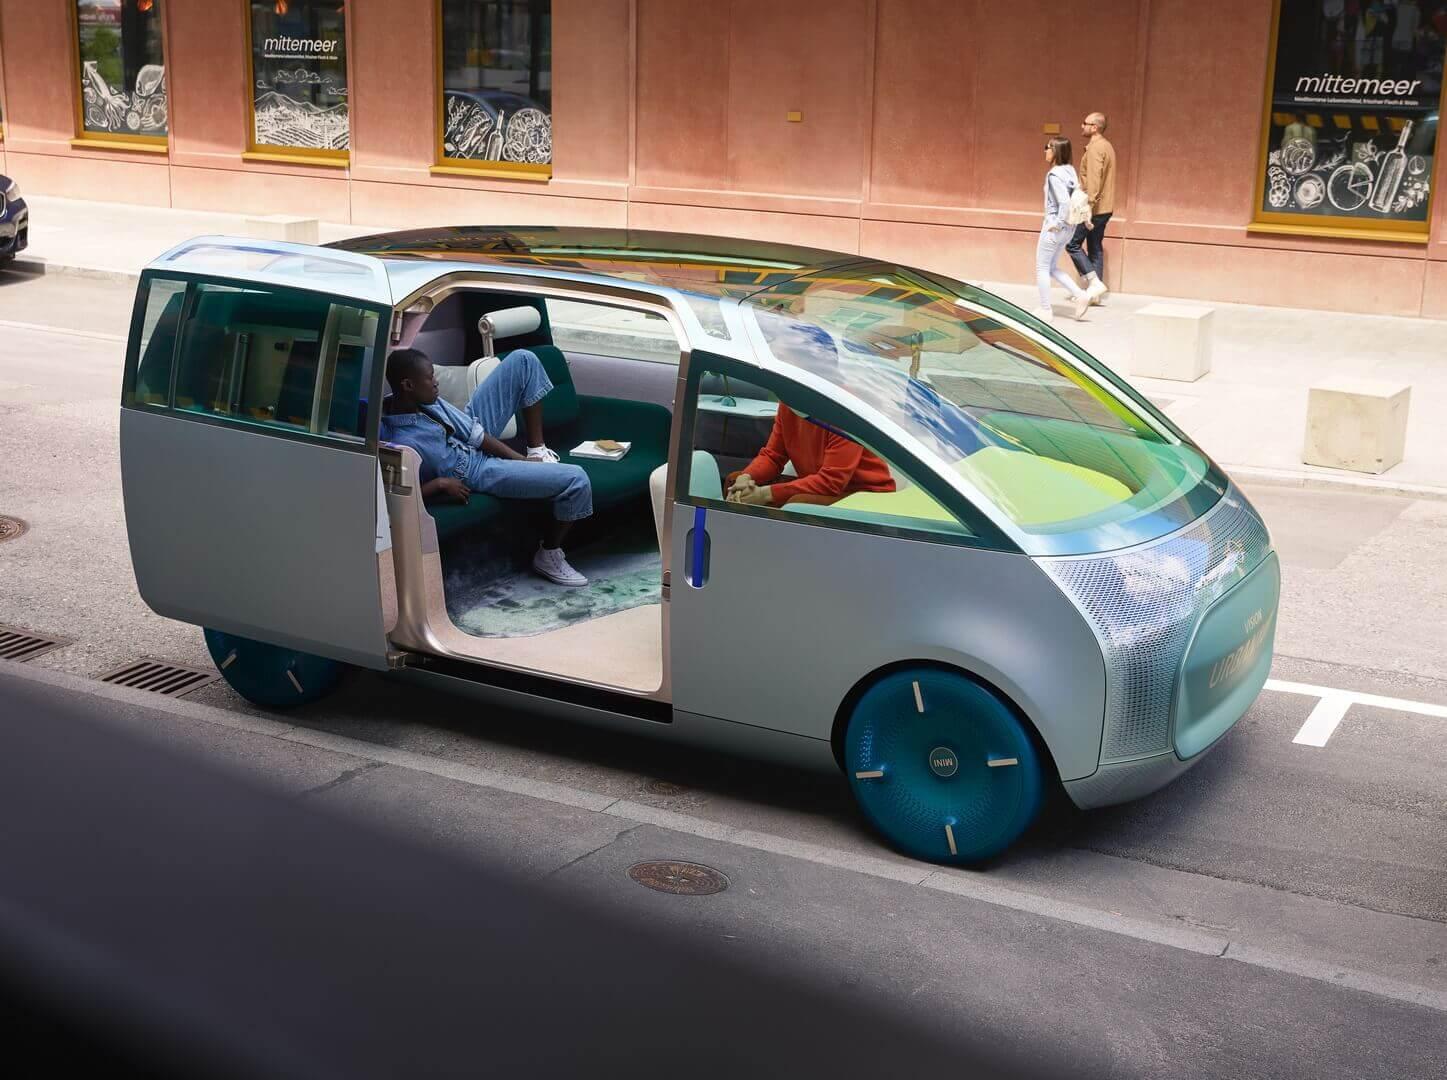 Концепт MINI Vision Urbanaut становится настоящим автомобилем